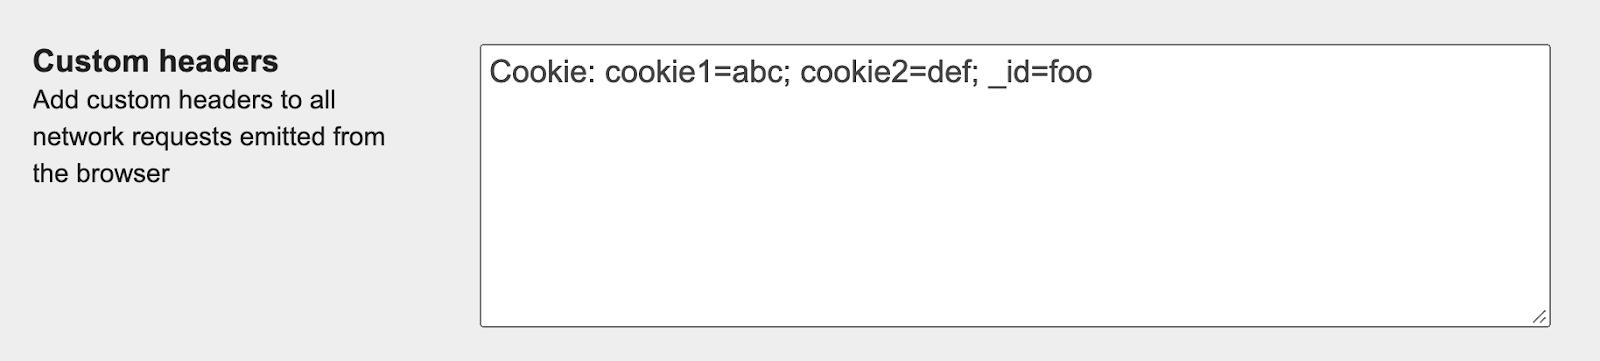 Screeshot showing the 'Custom headers' field in WebPageTest